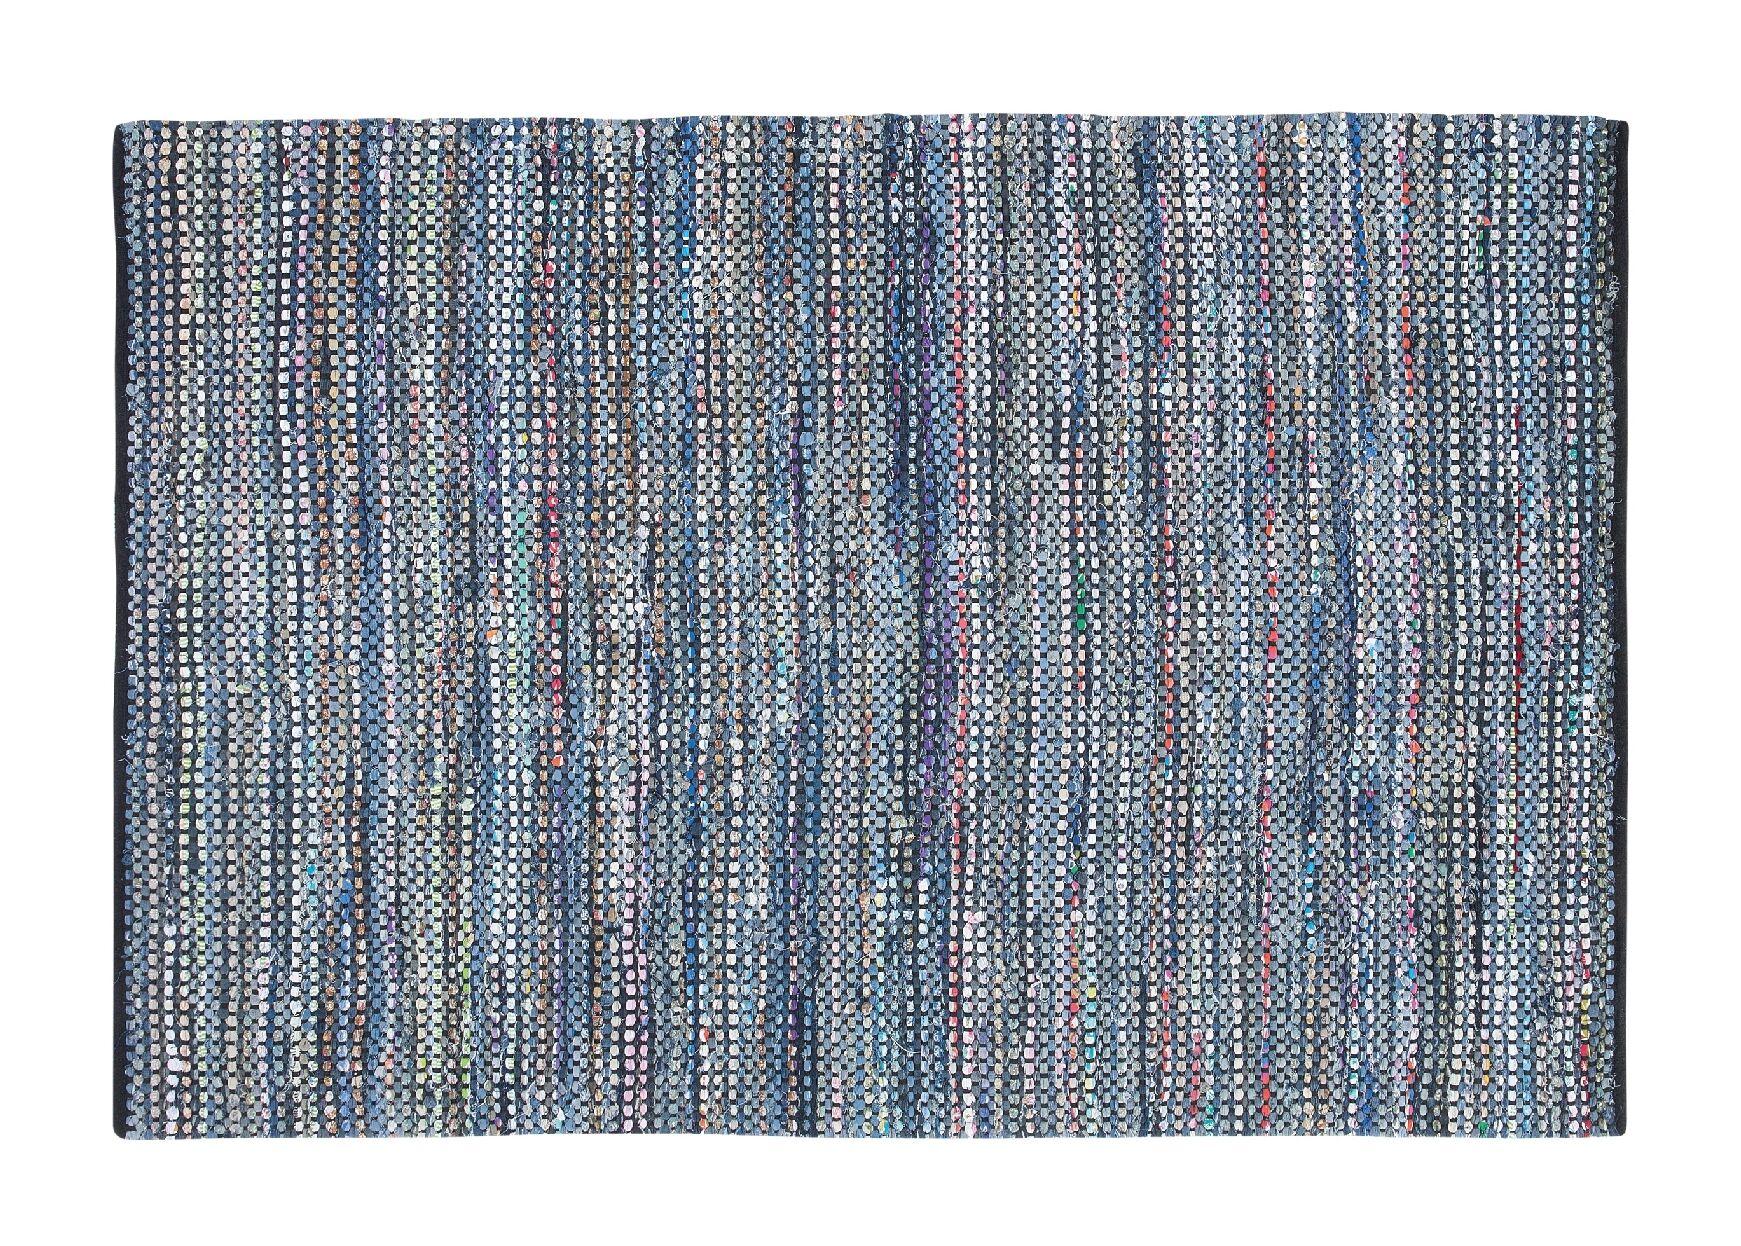 Alanya Hand-Woven Blue Area Rug Rug Size: 5'2